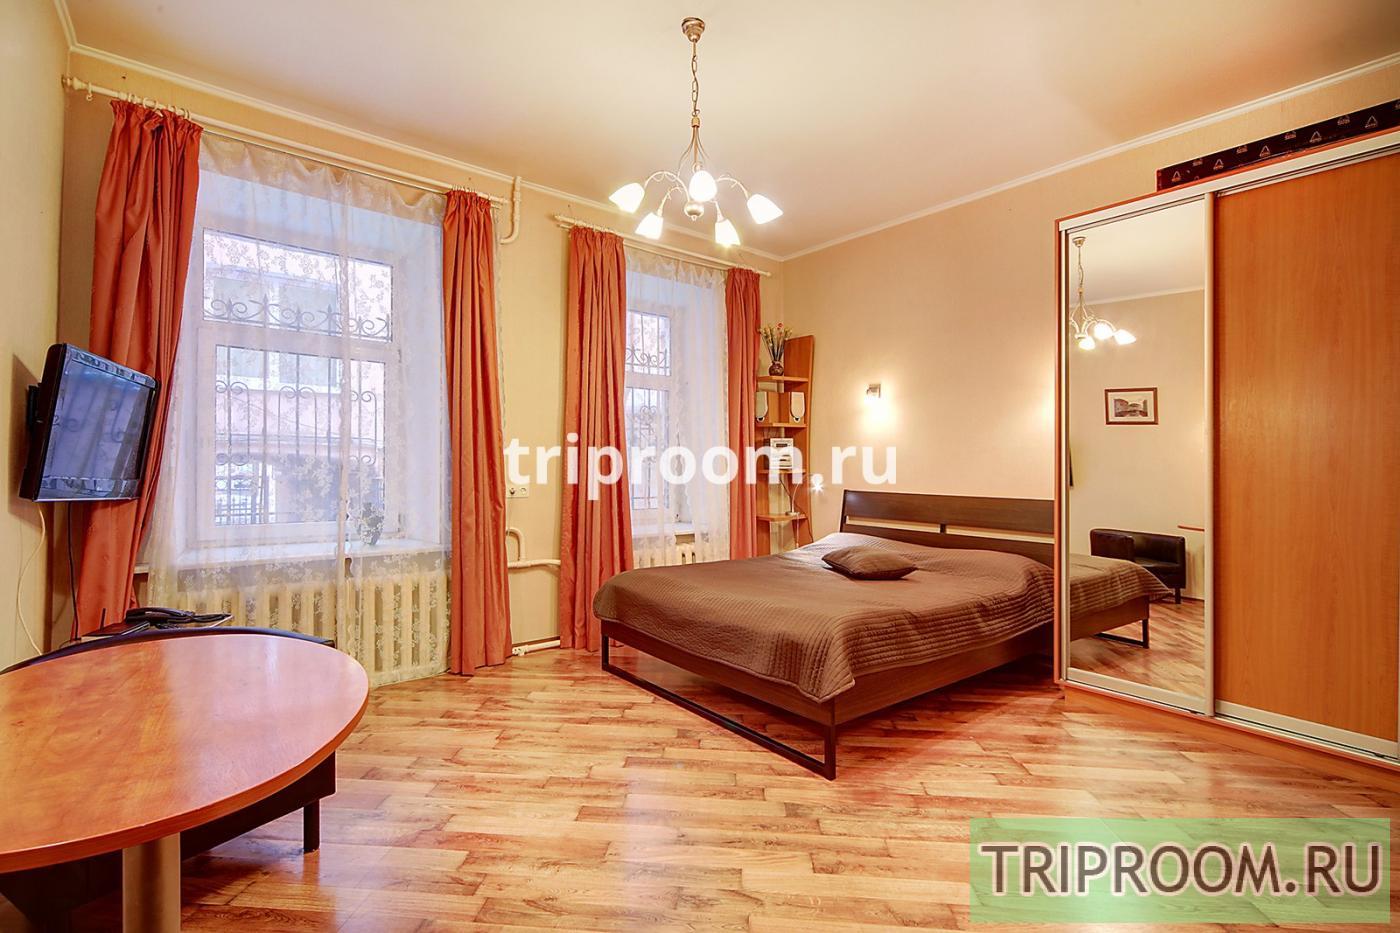 1-комнатная квартира посуточно (вариант № 15082), ул. Невский проспект, фото № 9